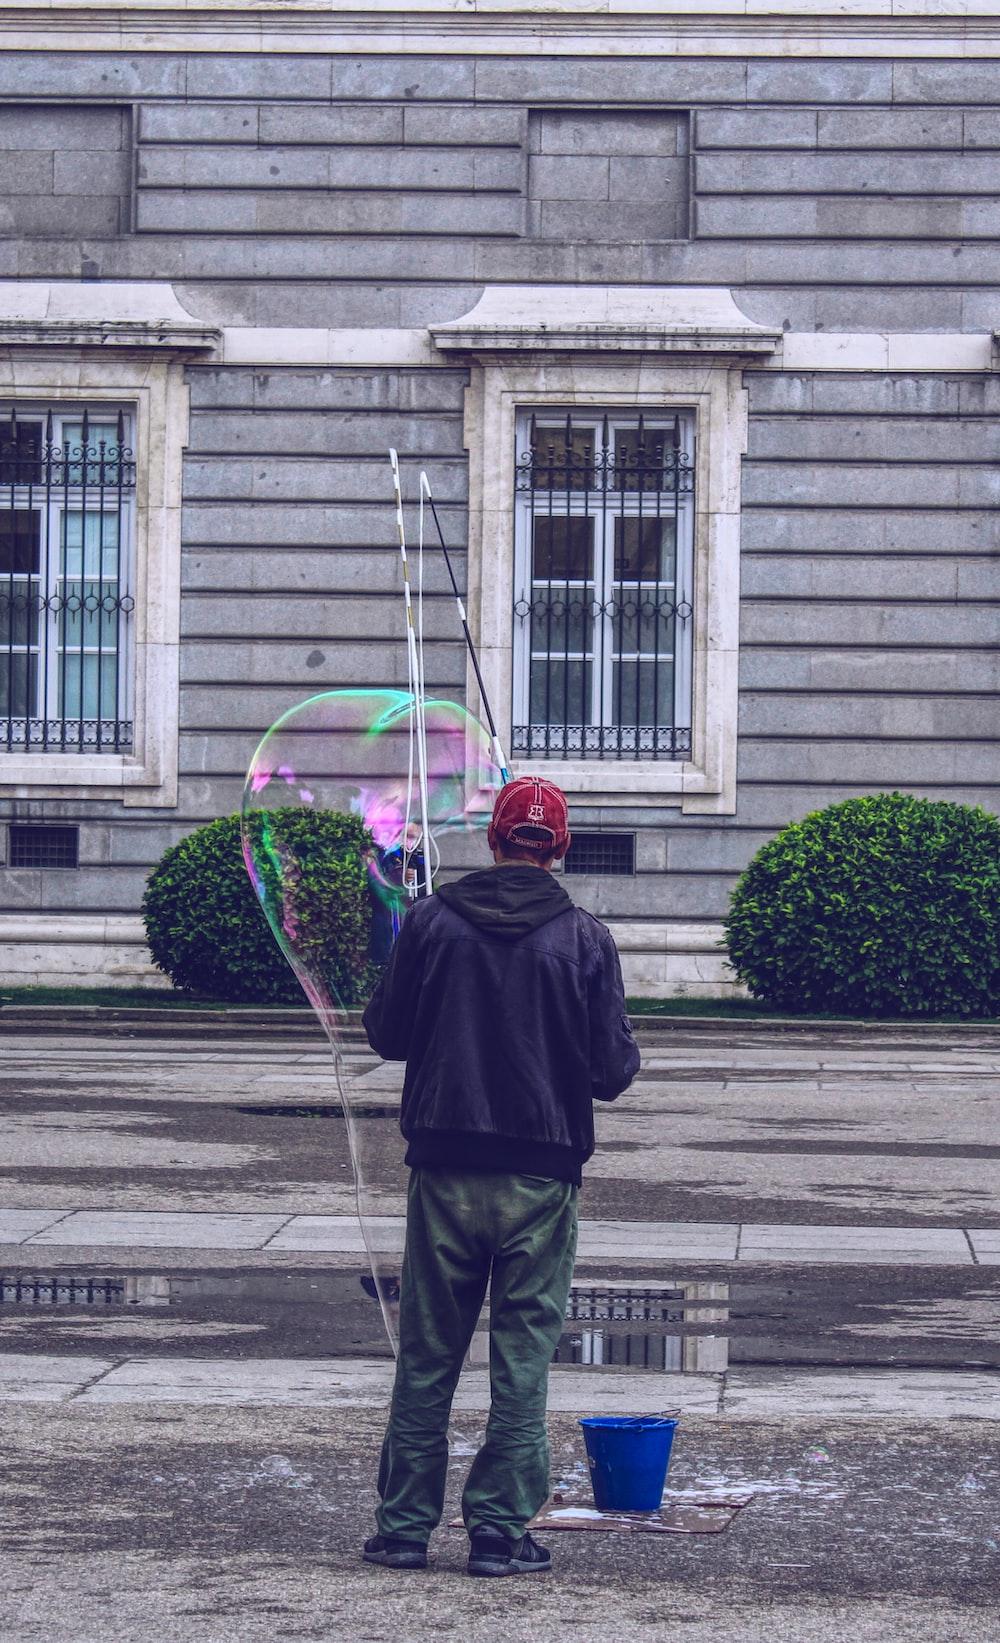 man forming giant bubble outside house